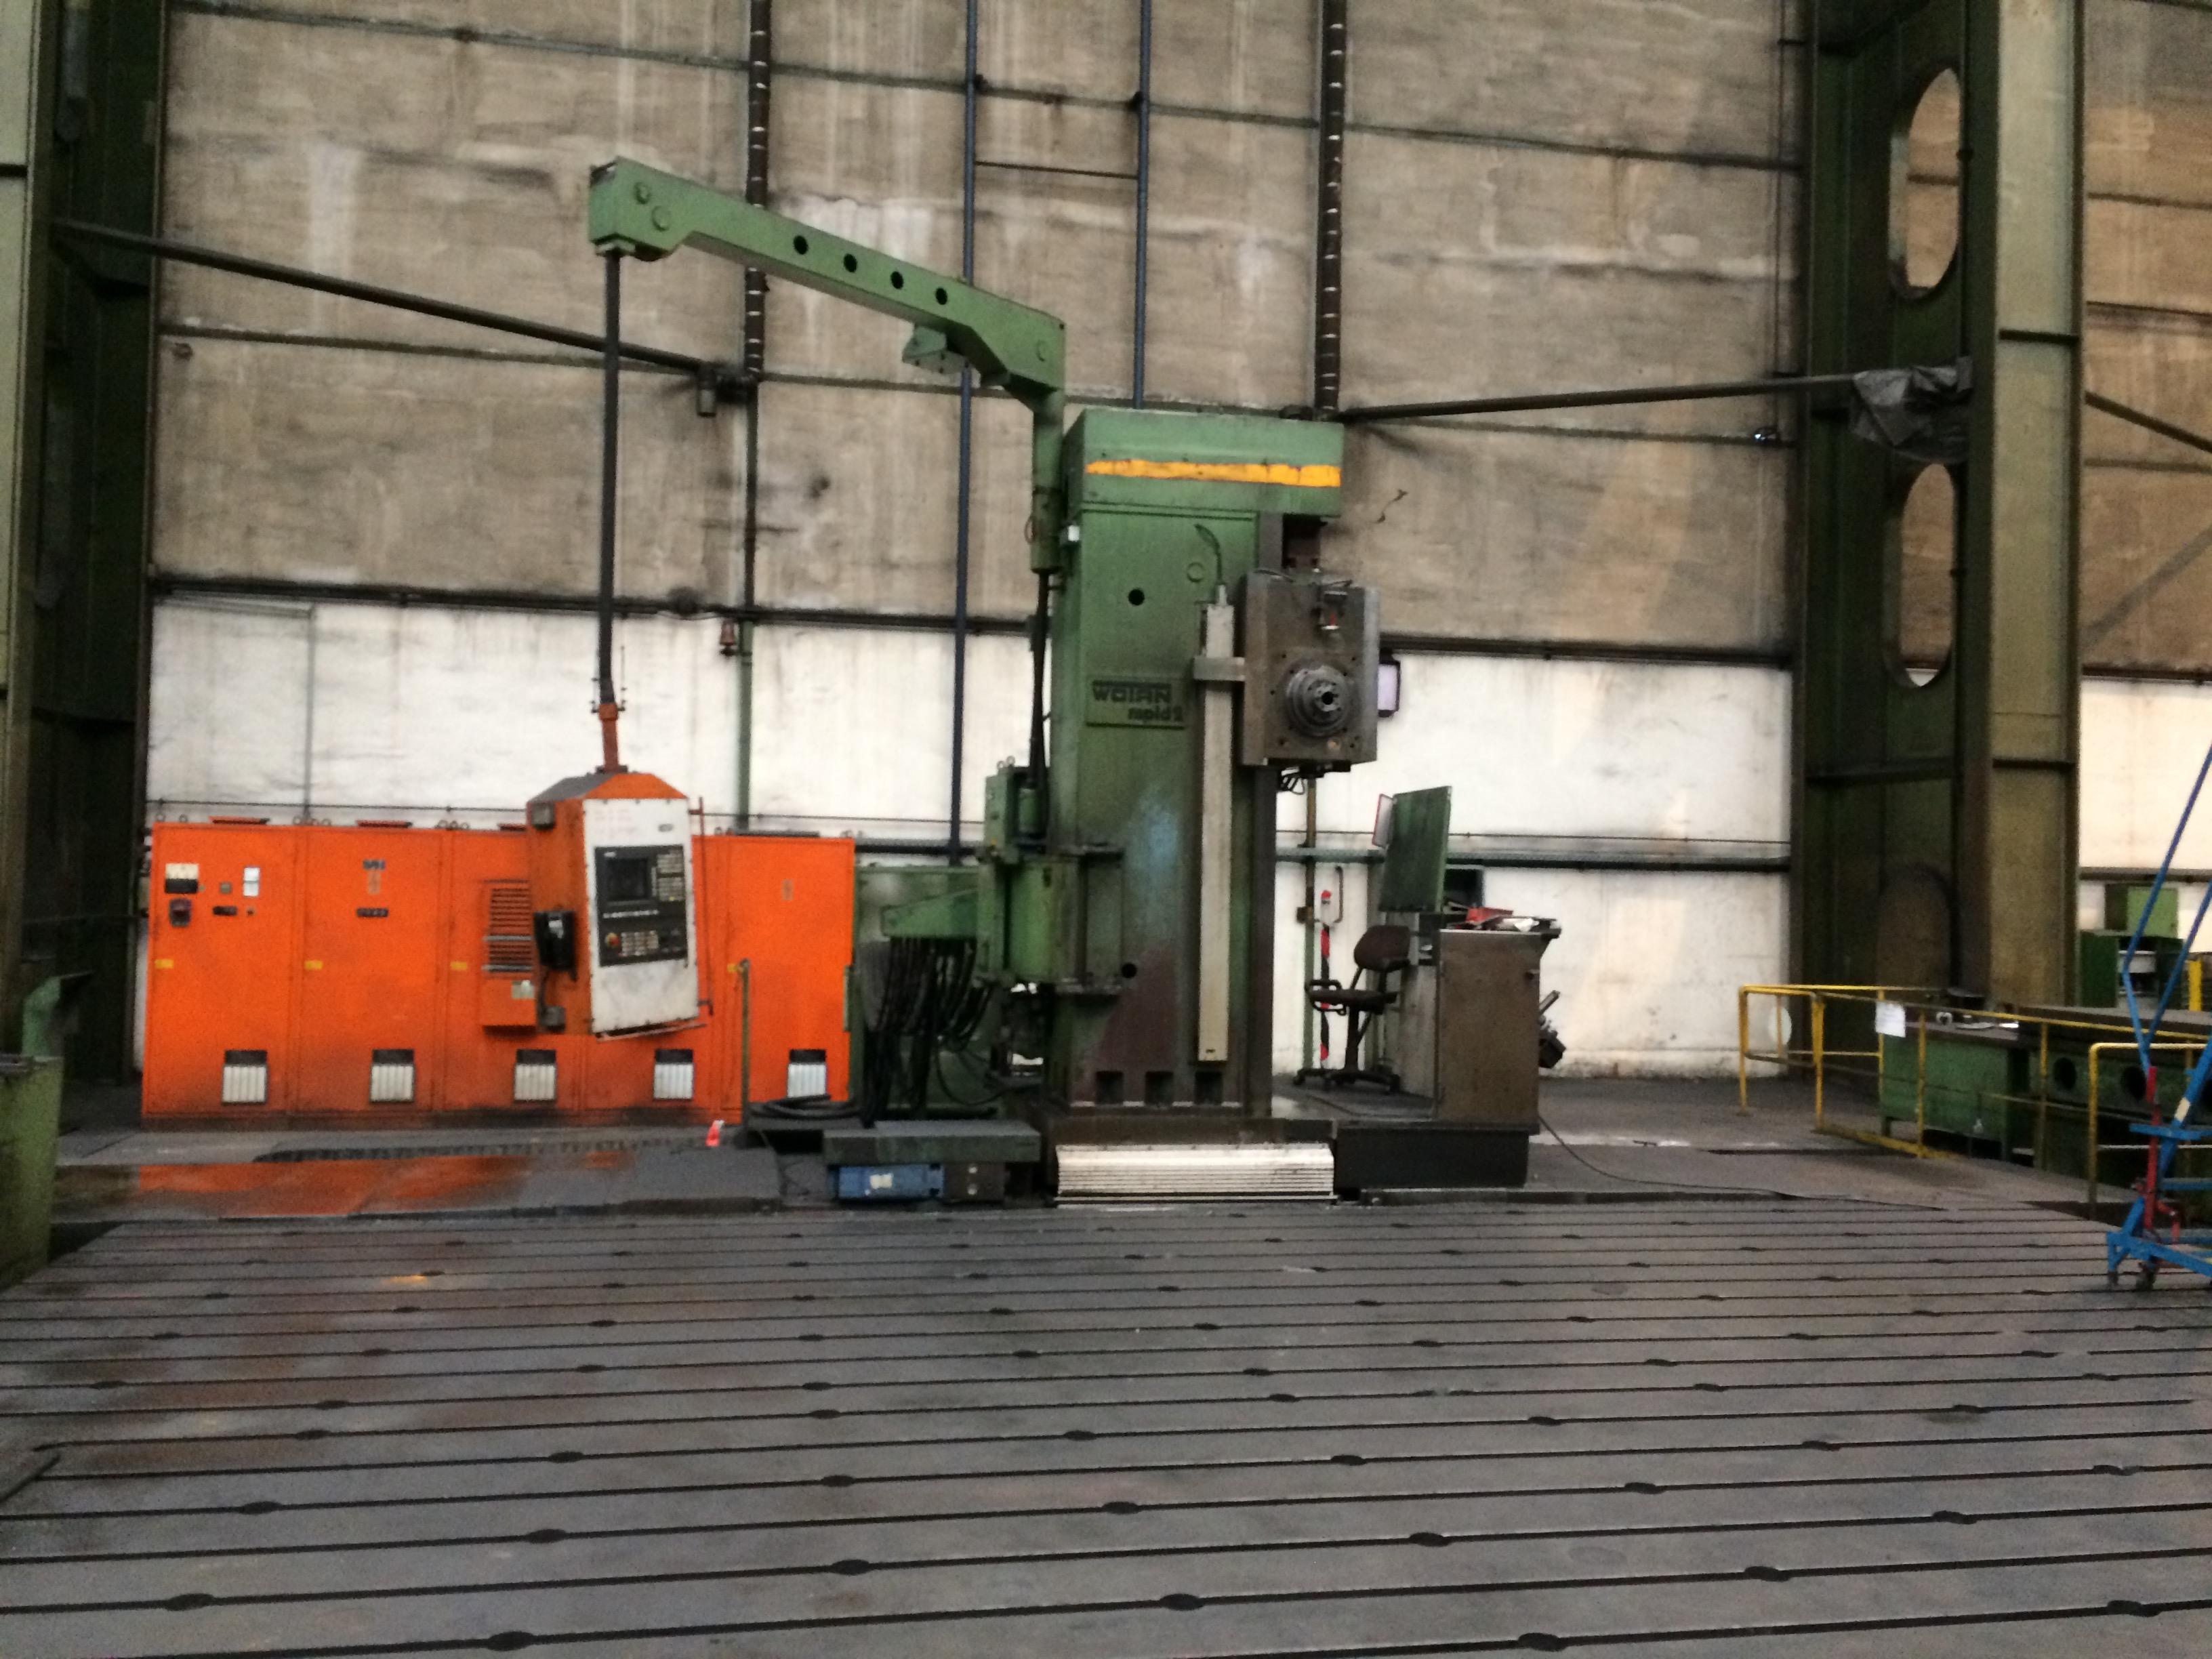 1 CNC Plattenbohrwerk, Fabr. WOTAN, Typ Rapid 2K